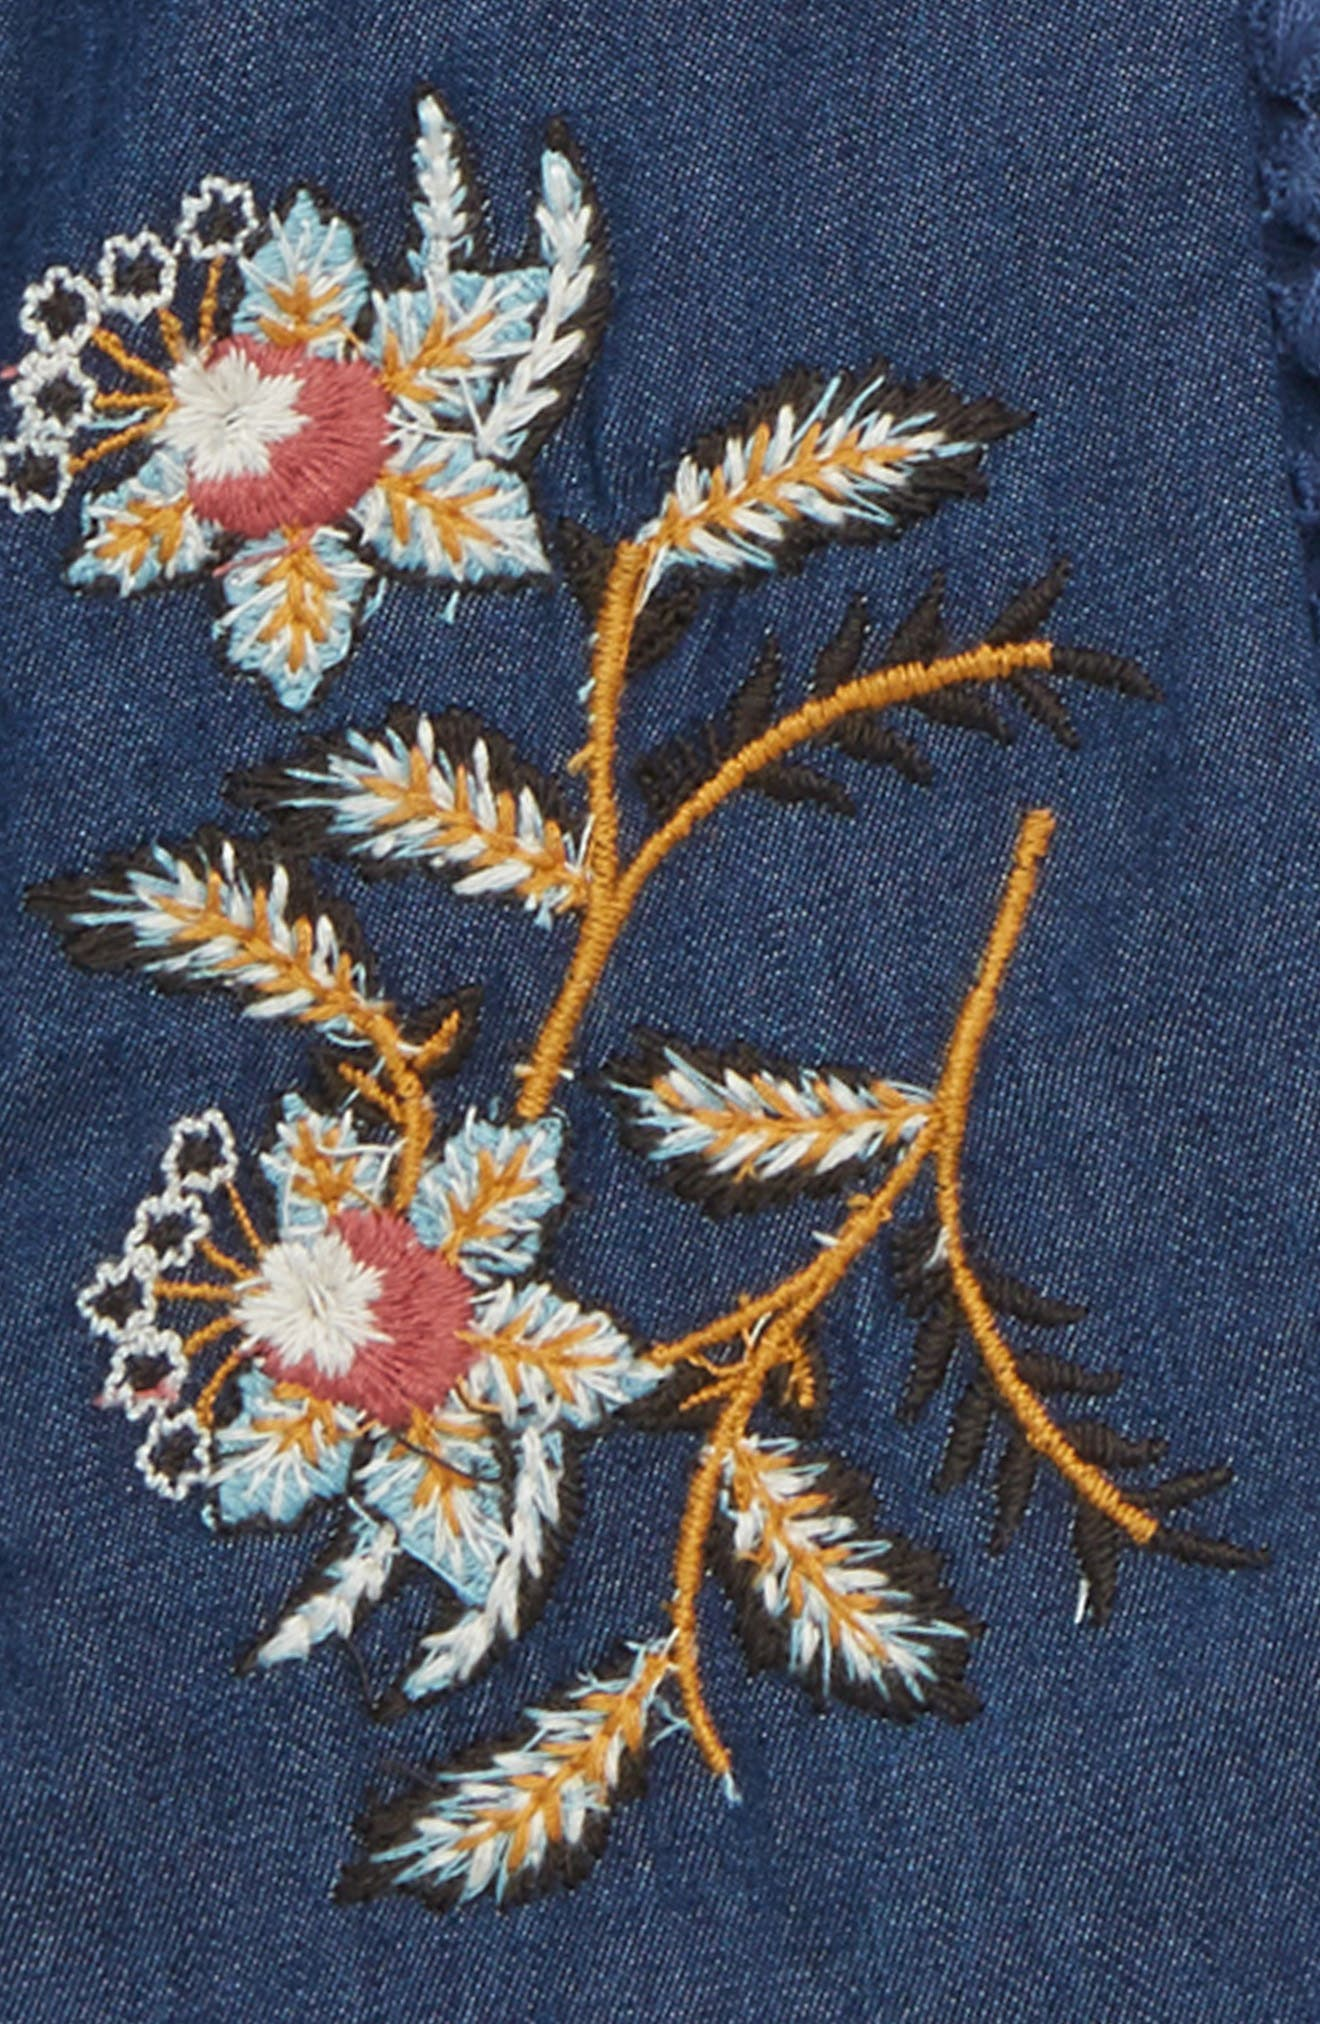 Peek Willow Embroidered Denim Dress,                             Alternate thumbnail 2, color,                             410